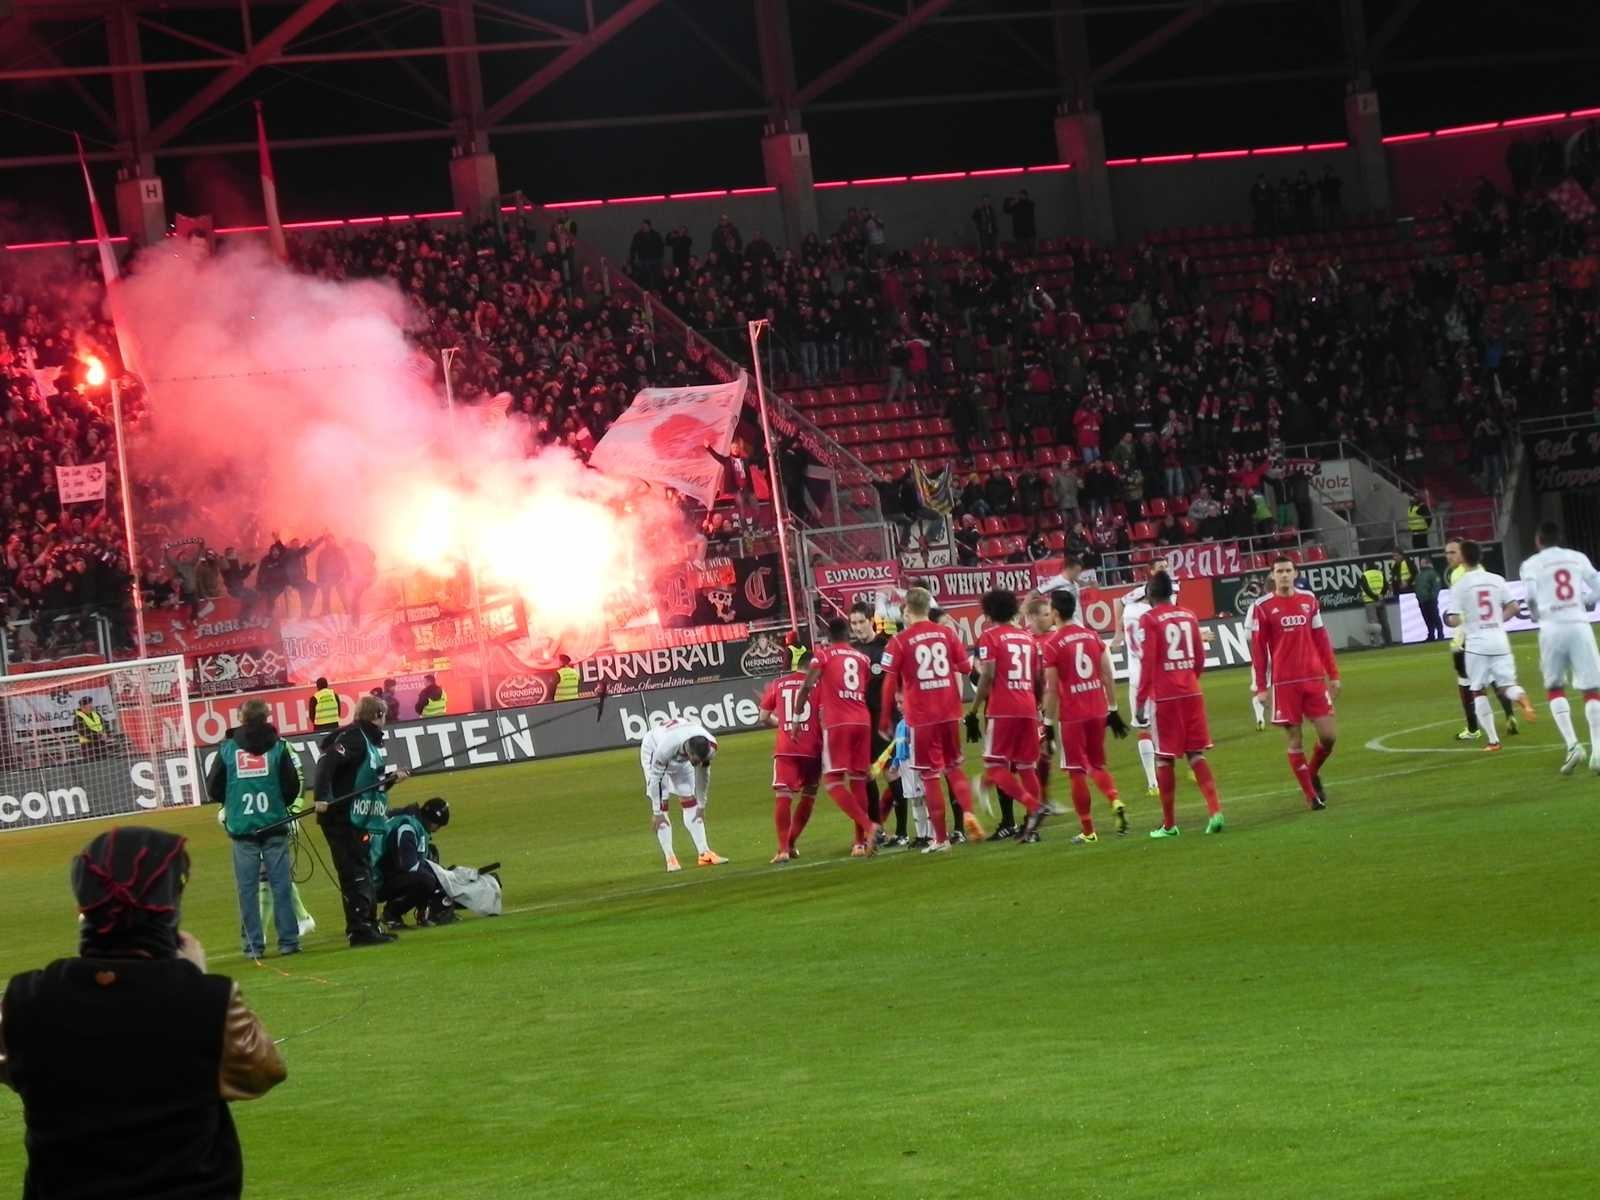 Bengalos abbrennen bereits vor Spielbeginn - Chaoten - FC Ingolstadt Maurice Fussballsammlung Torwart Sammlung